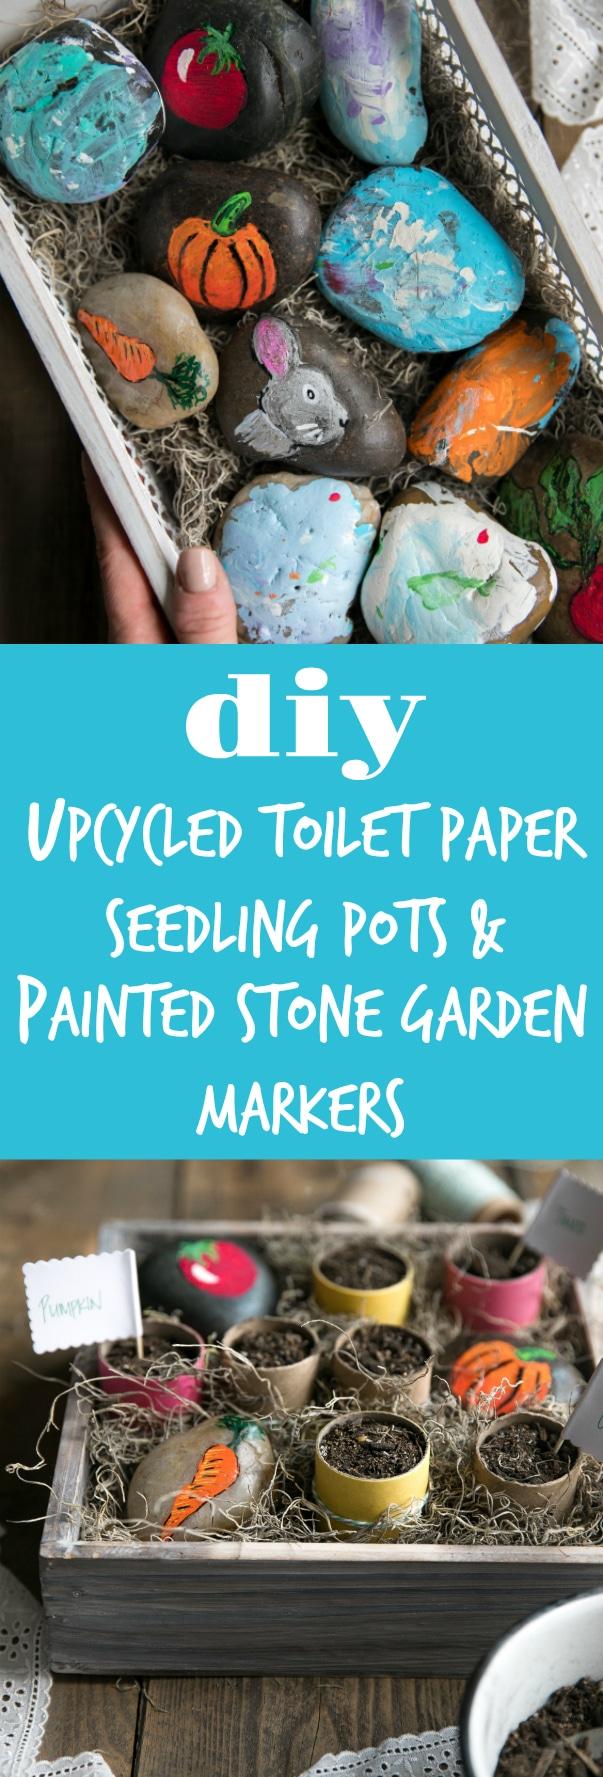 @PeterRabbitMovie hits theaters on Feb 9! #PeterRabbitMovie DIY Upcycled Toilet Paper Seedling Pots and Painted Stone Garden Markers #sponsored #peterrabbit  #garden #painting #DIY #kids #crafts via @theforkedspoon